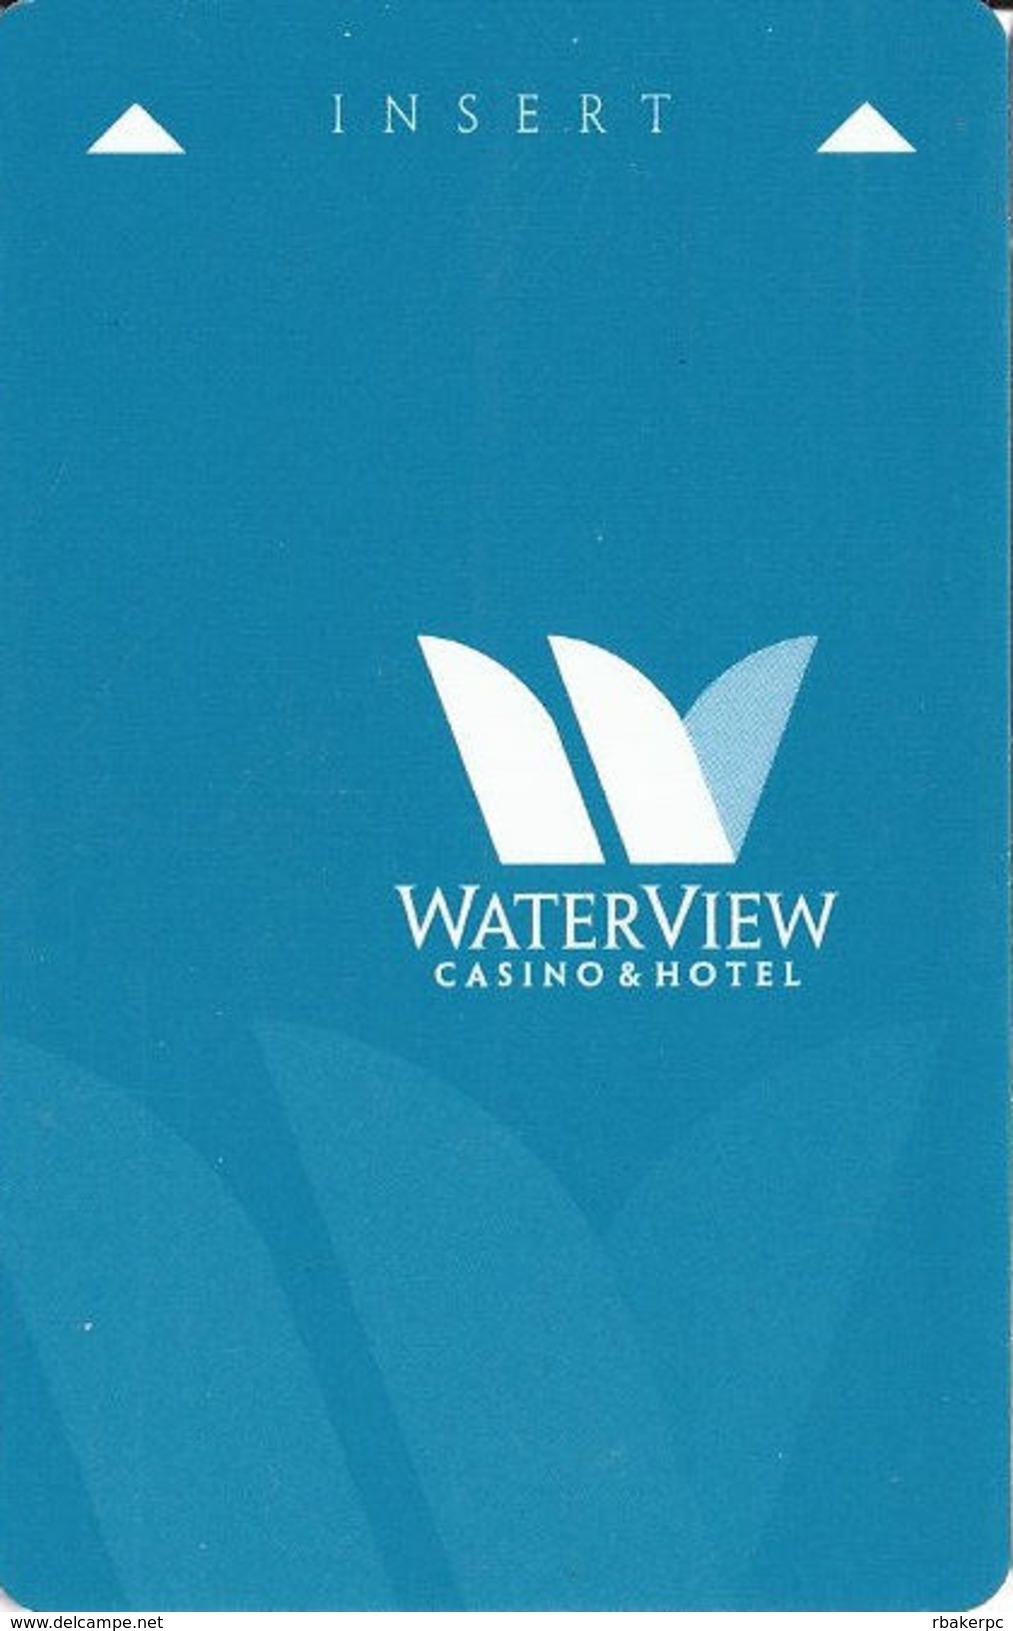 Waterview Casino & Hotel - Vicksburg, MS - Hotel Room Key Card - Hotel Keycards